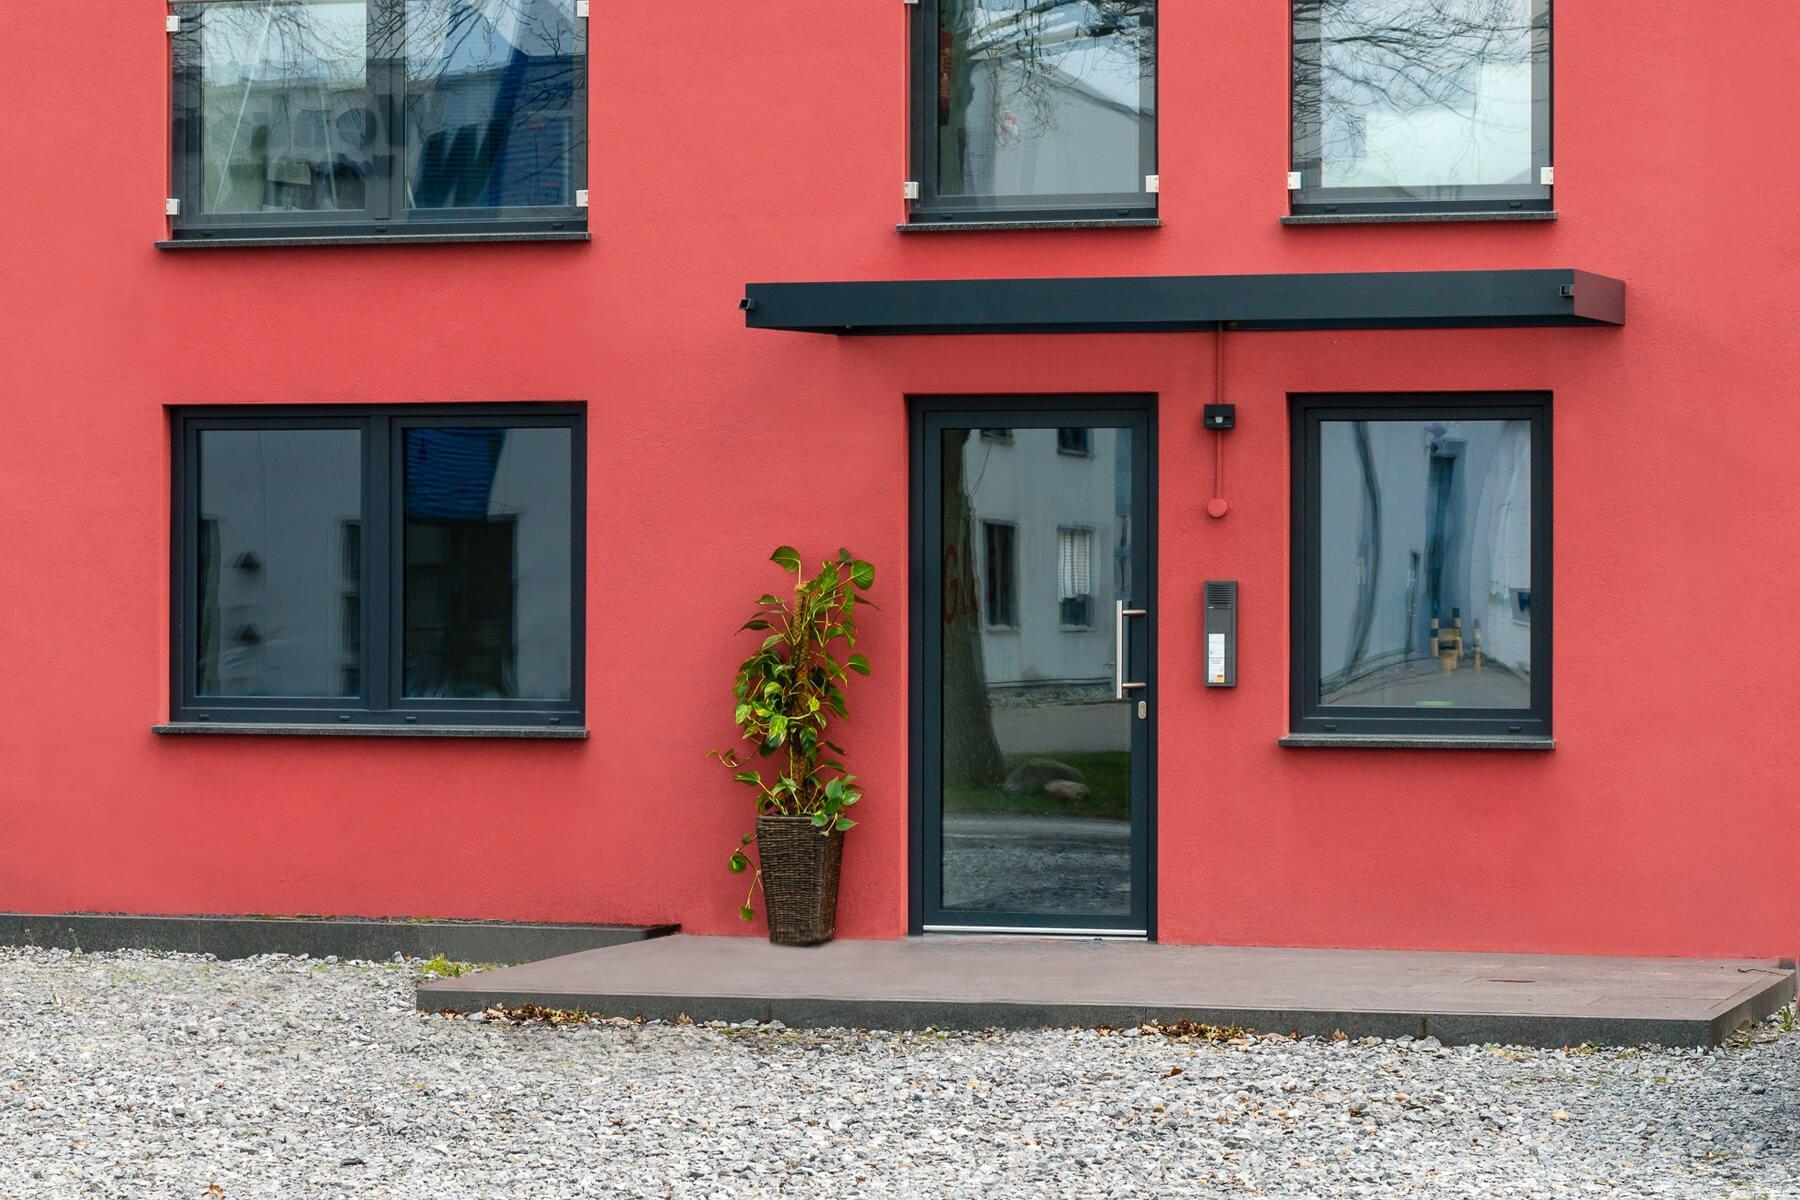 Hochwertiges Vordach an roter Fassade